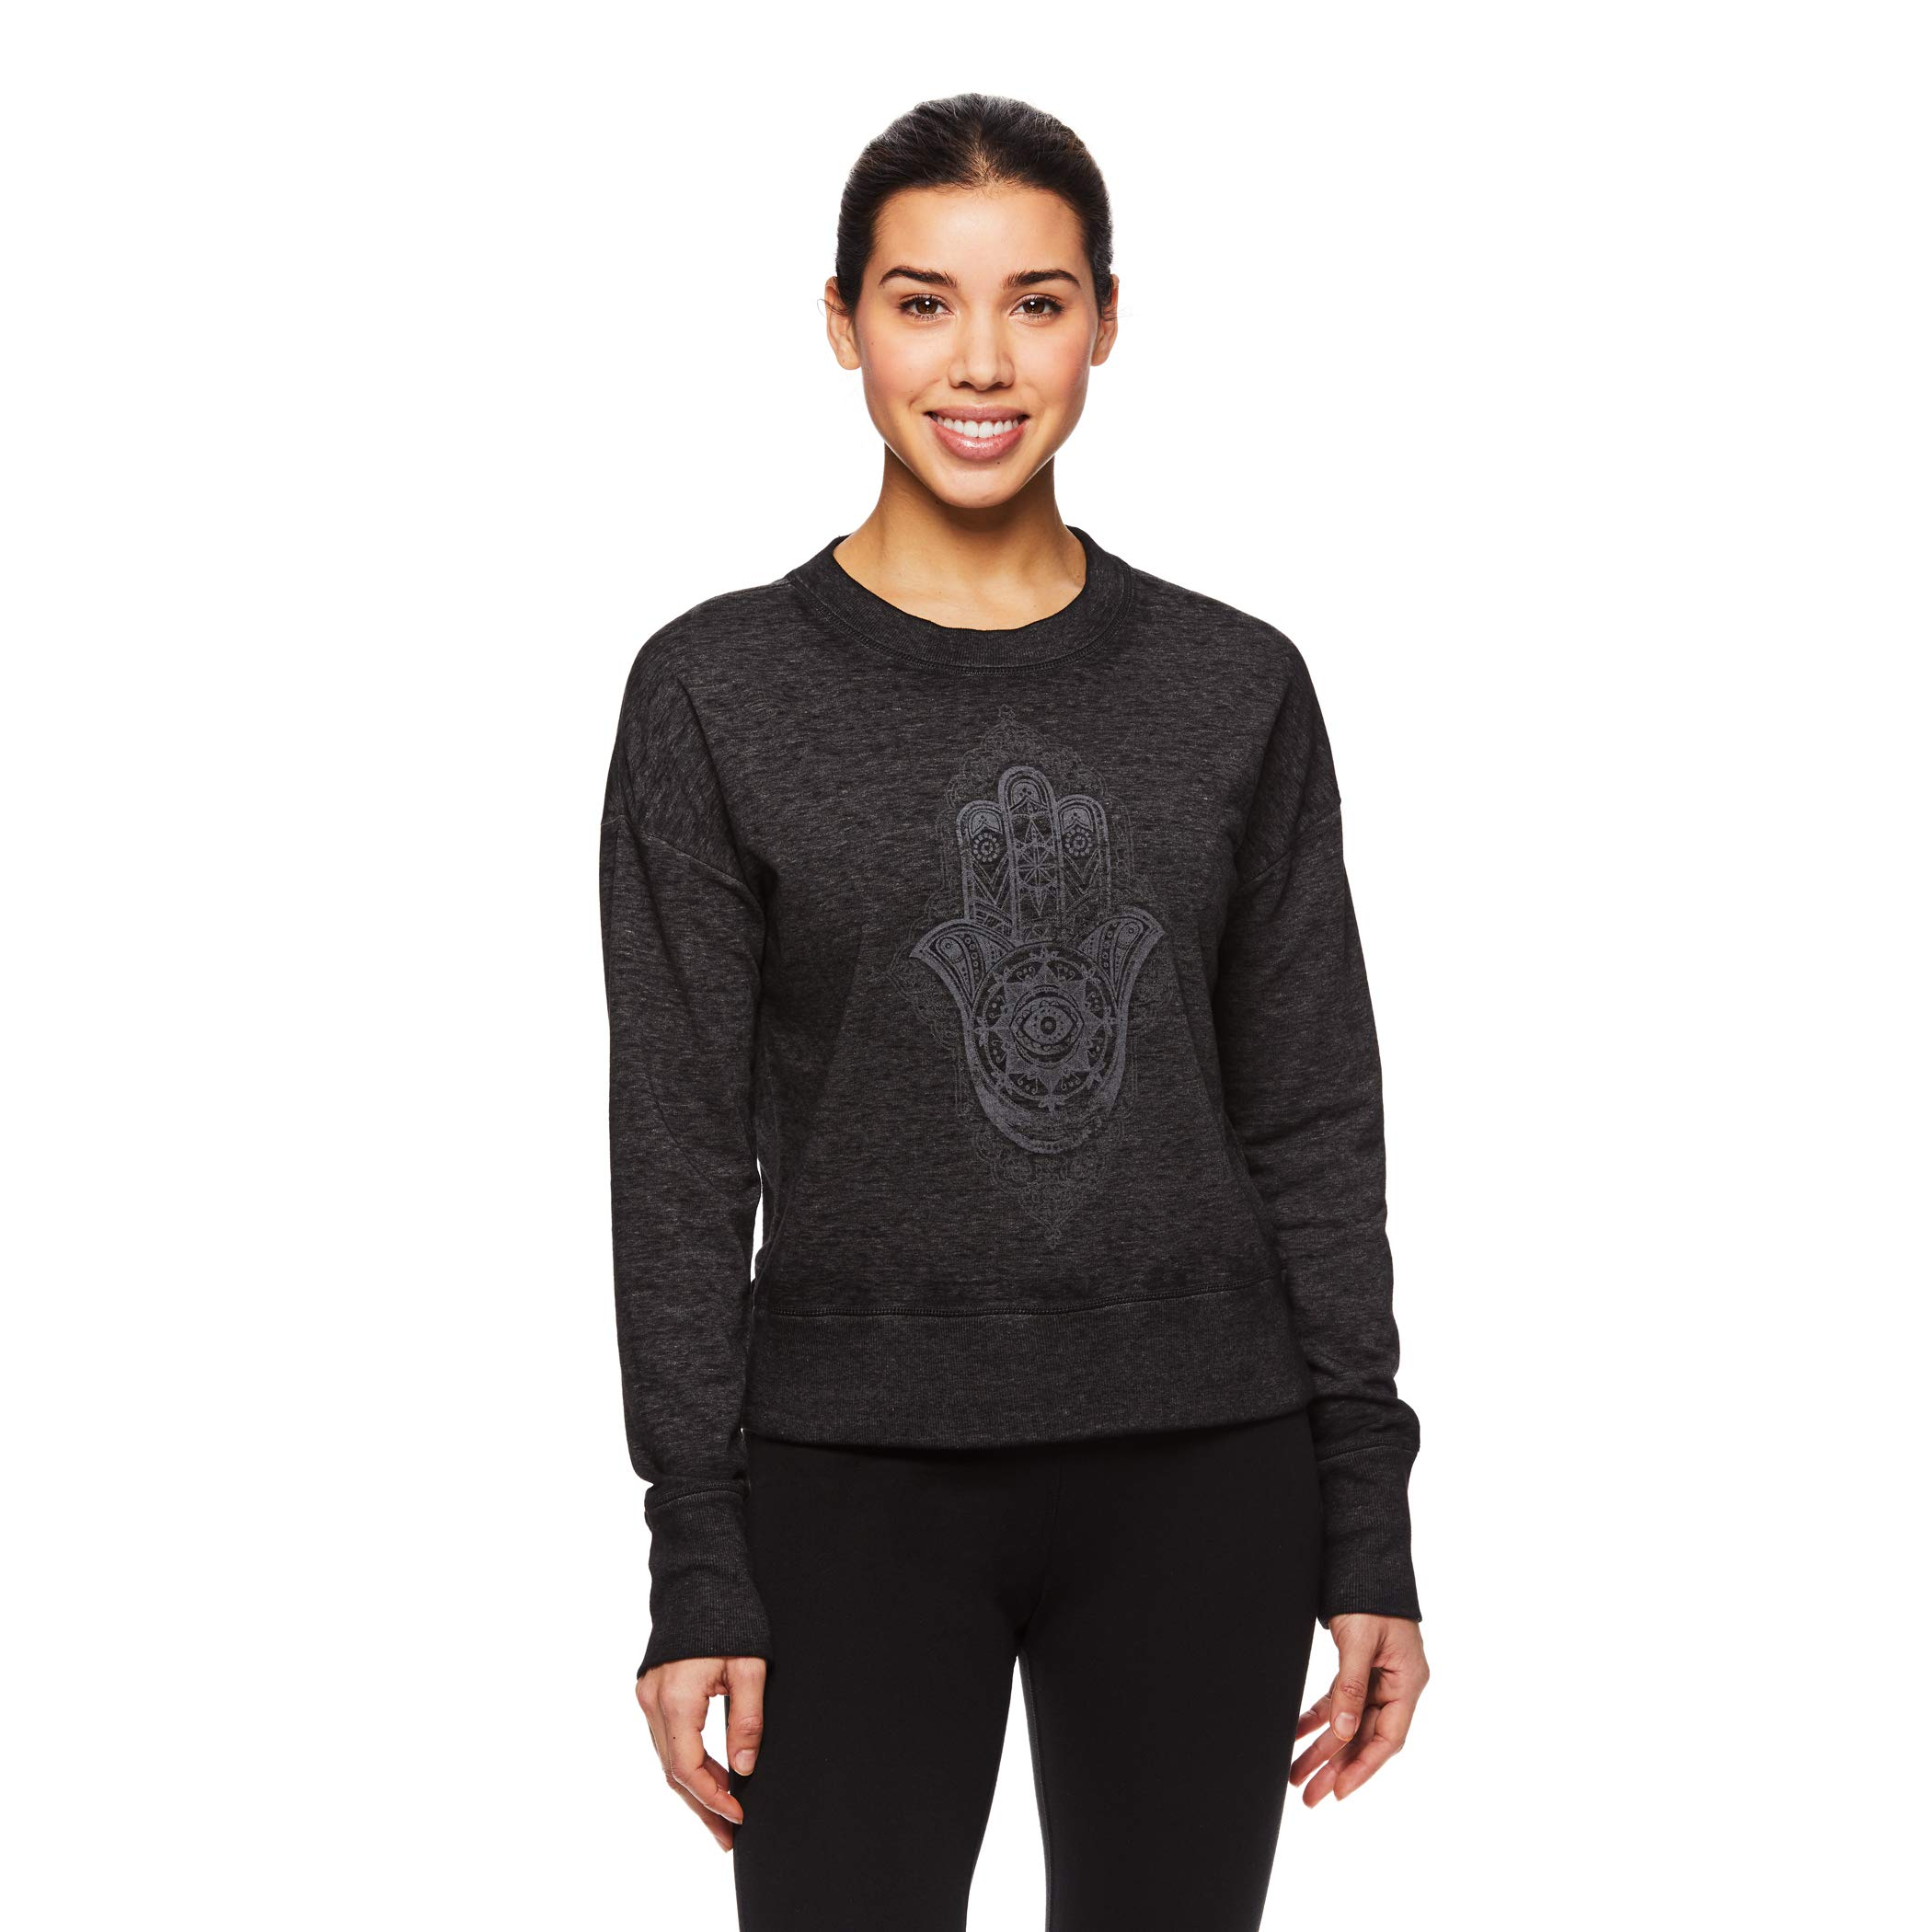 Gaiam Women's Pullover Fleece Yoga Sweatshirt - Long Sleeve Graphic Activewear Sweater - Black (Tap Shoe), Large by Gaiam